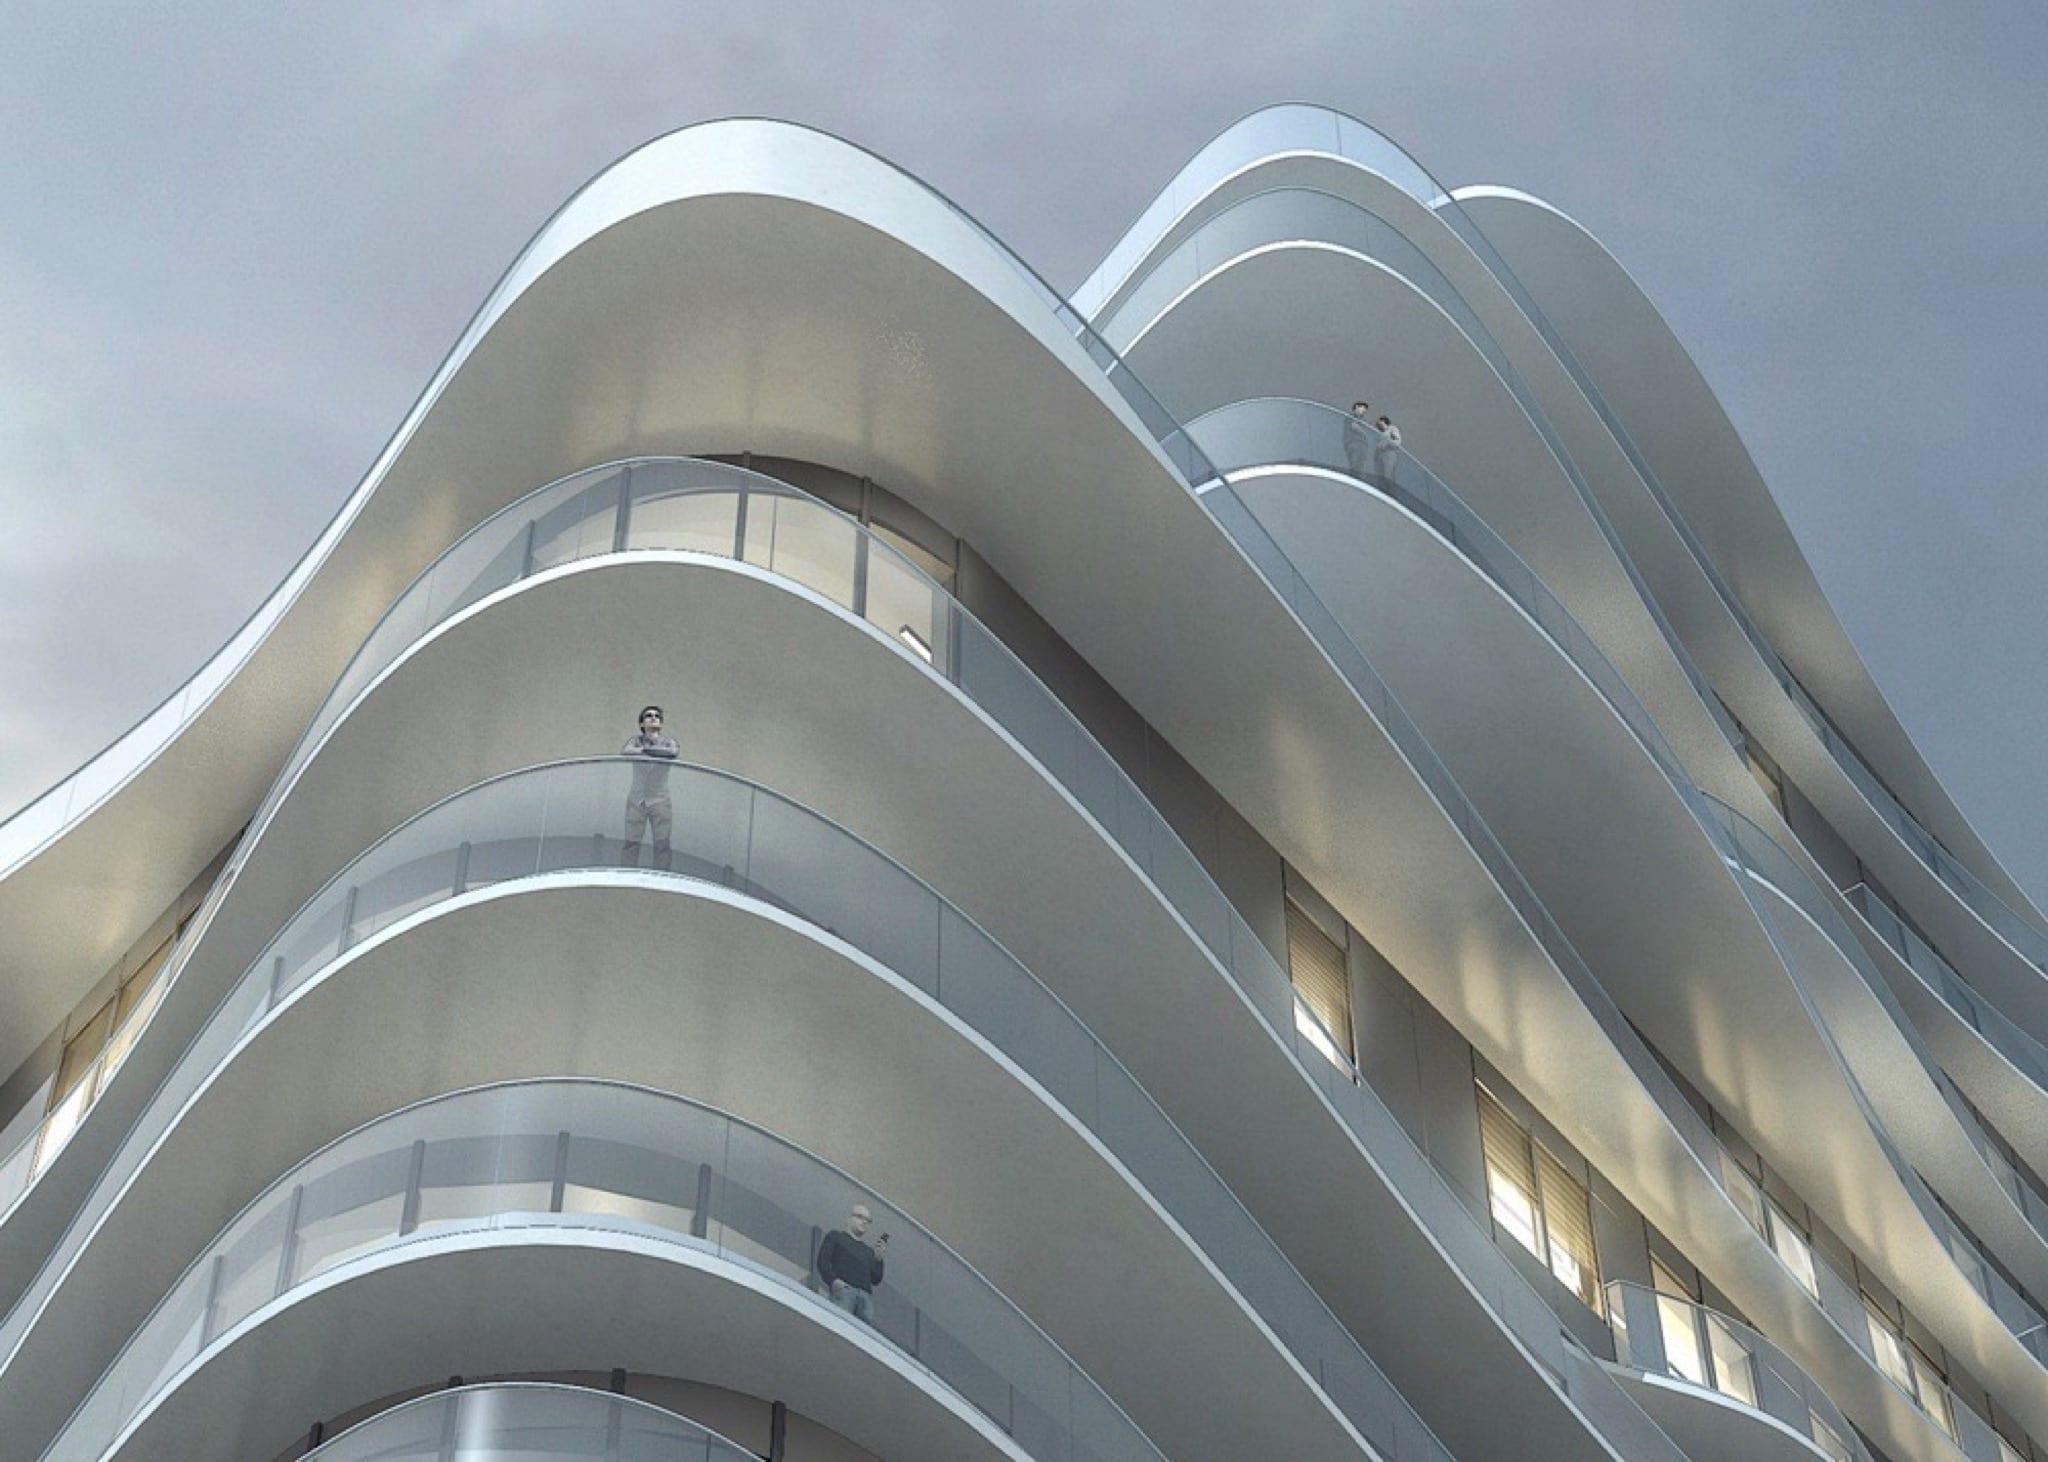 unic paris housing by mad architects x200516 3 copy - Piața imobiliară europeană – perspective optimiste